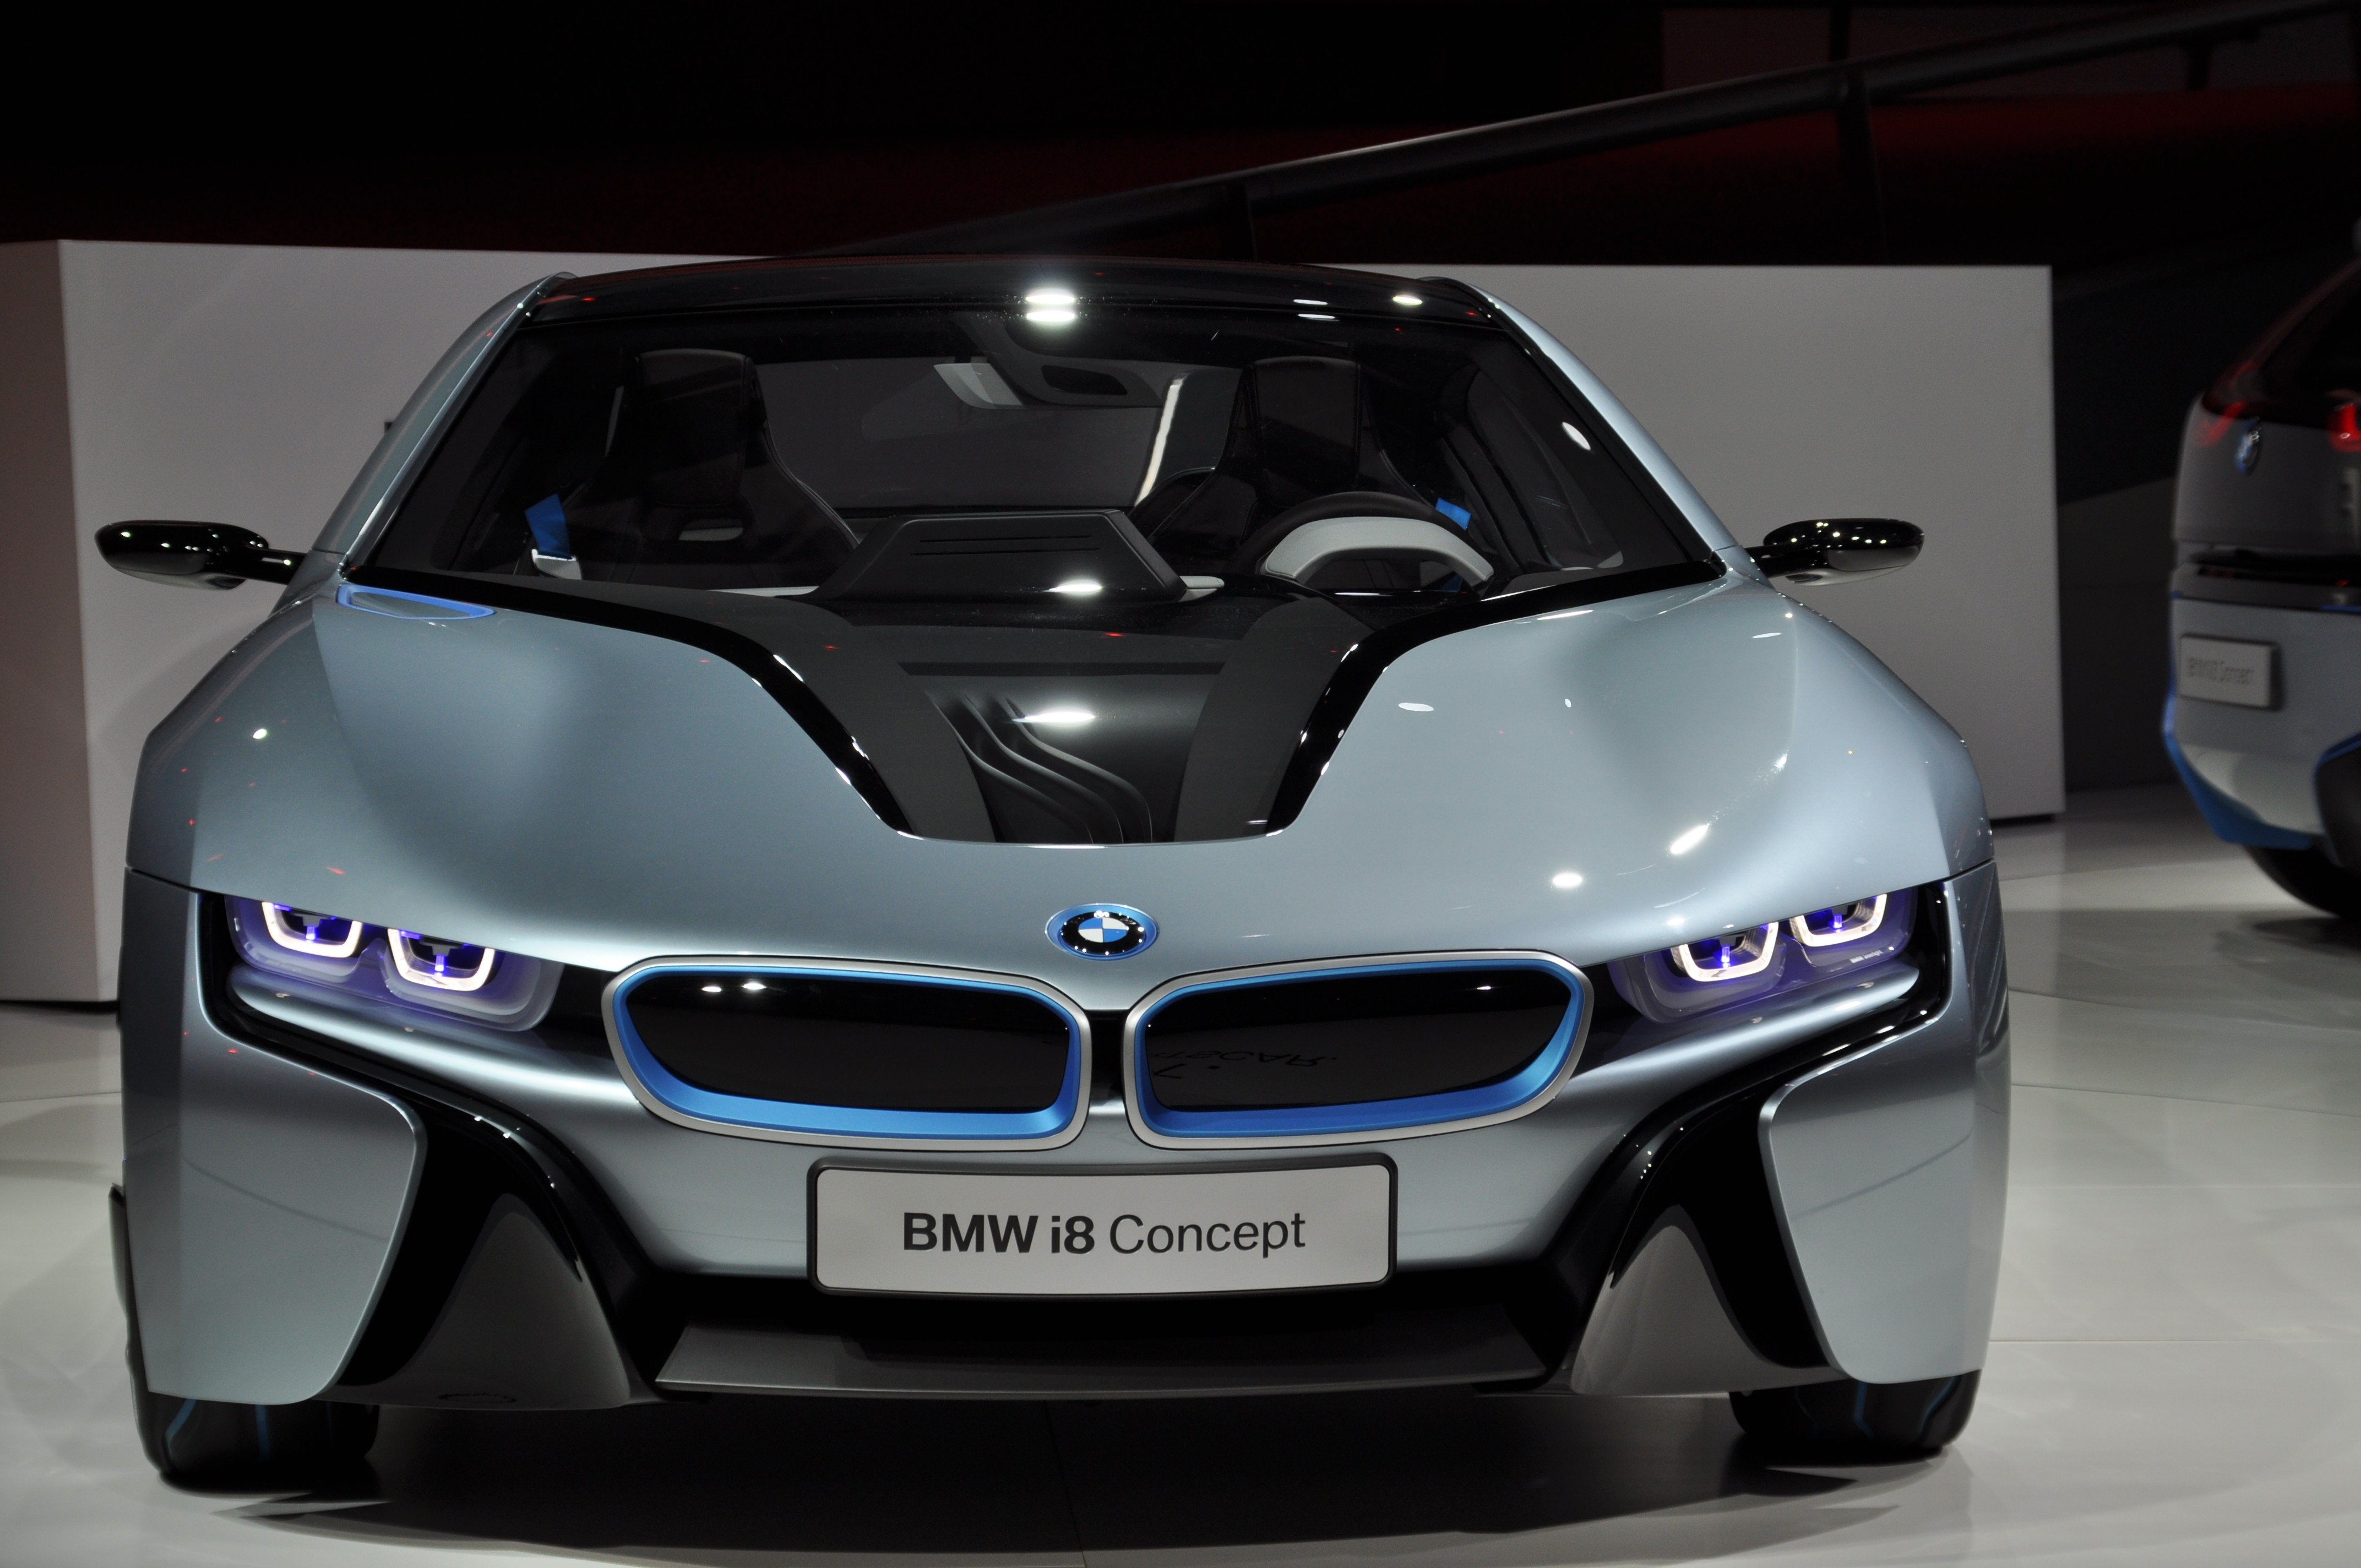 General 4288x2848 BMW BMW i8 IAA car vehicle concept cars BMW Vision